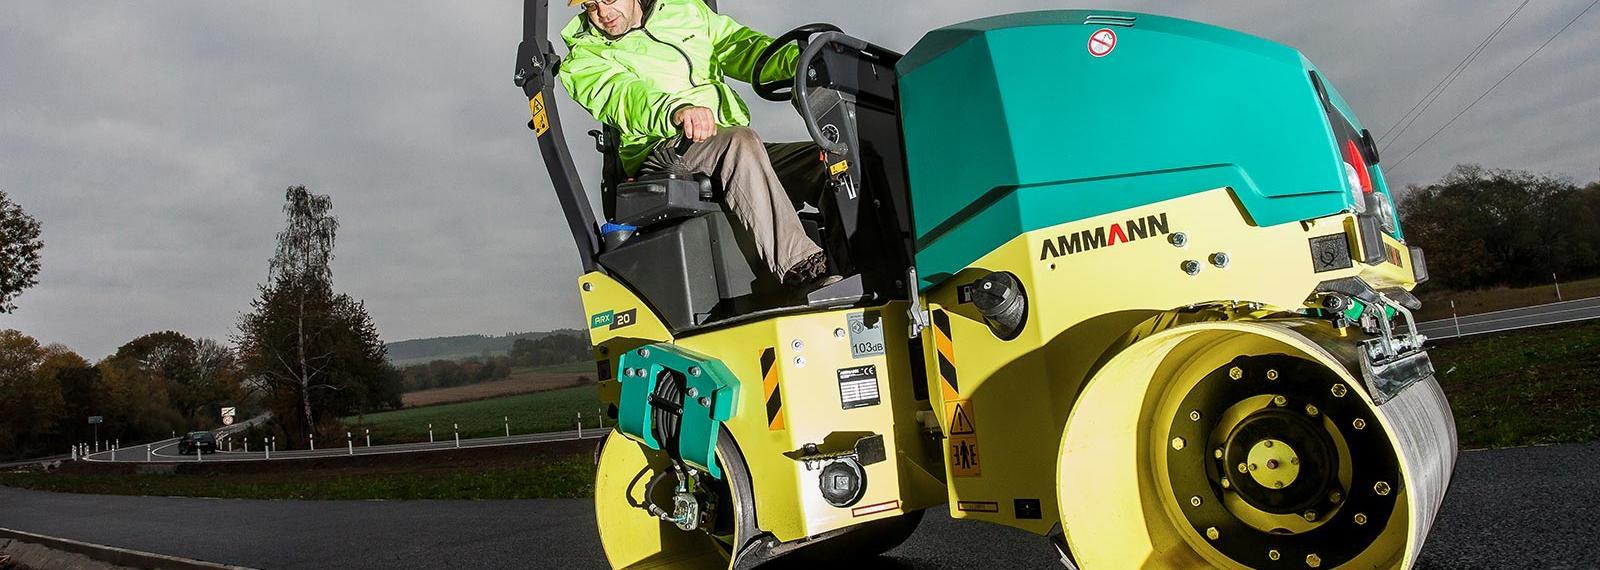 Ammann ARX20 Roller